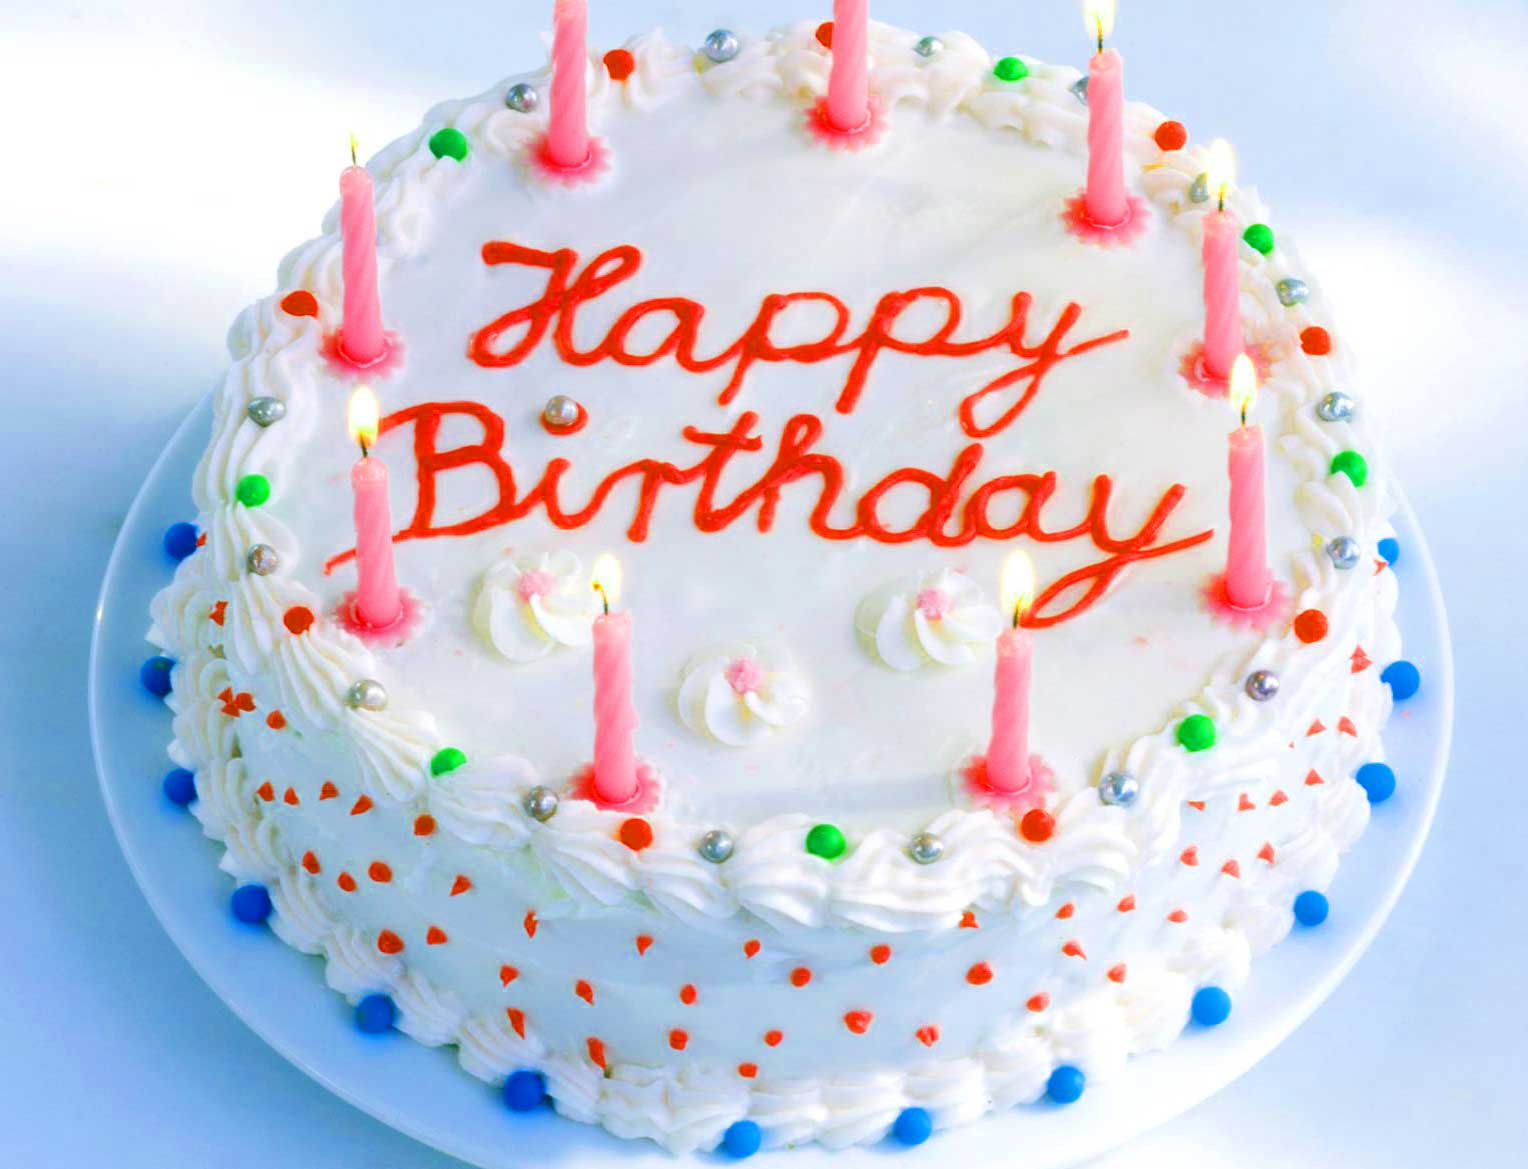 202+ Cake Happy Birthday Wallpaper Photos Free Download